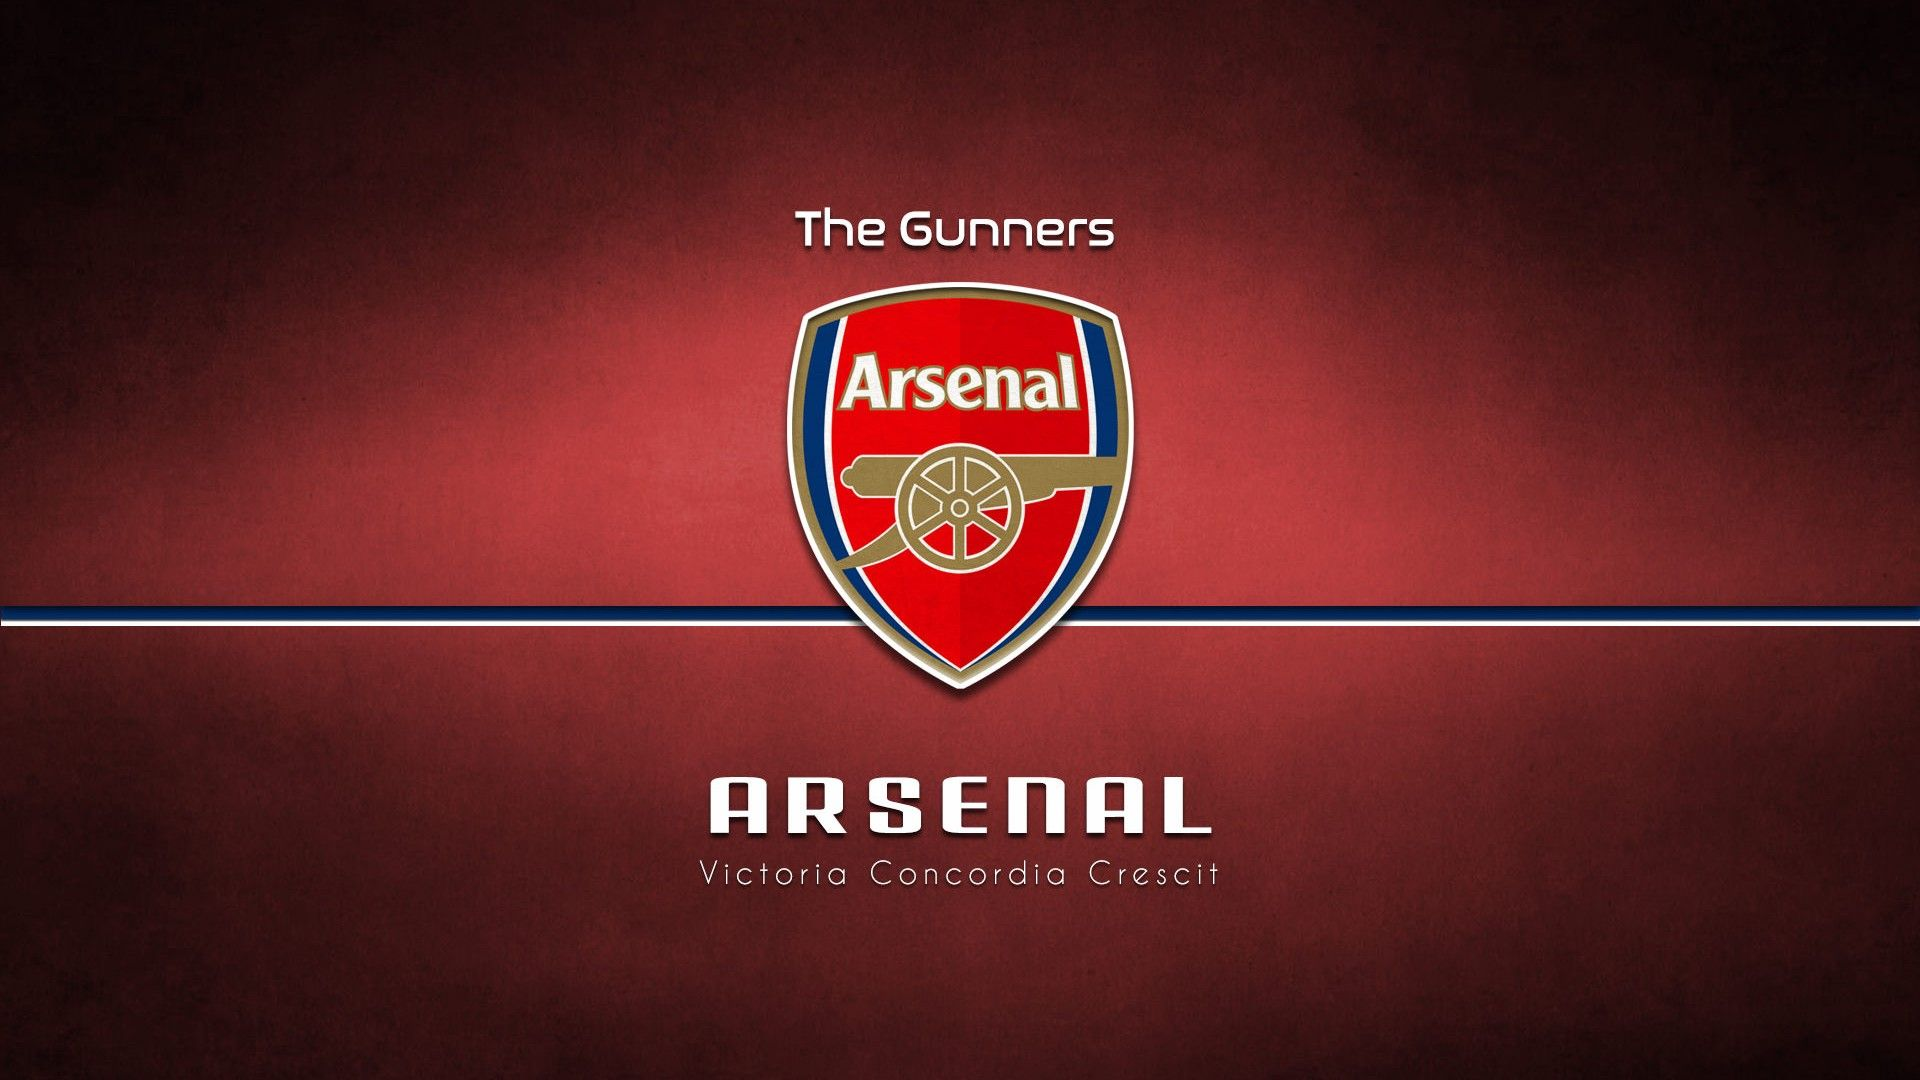 Arsenal Wallpaper For Mac Backgrounds Best Football